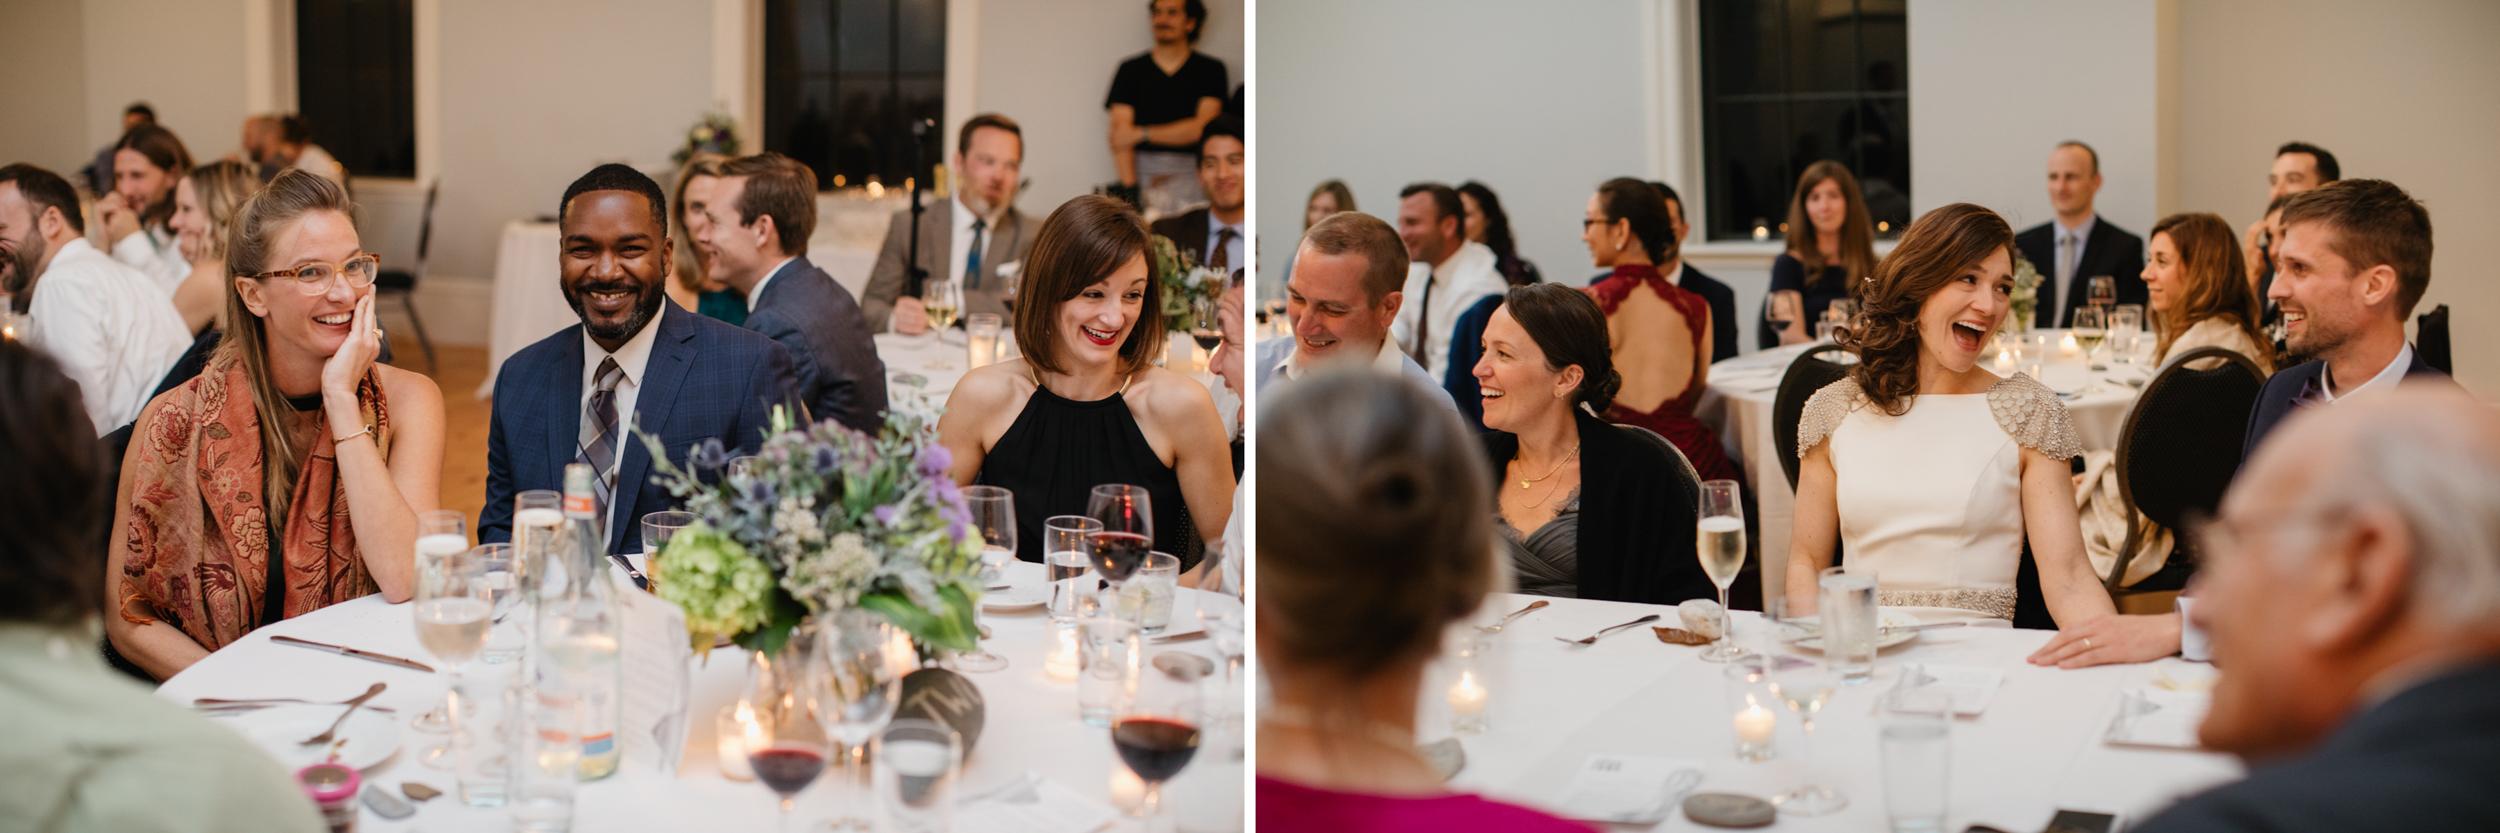 Mackenzie_Collins_Maine_wedding_in_Rockport_Union_hall_Nina_June_027.jpg